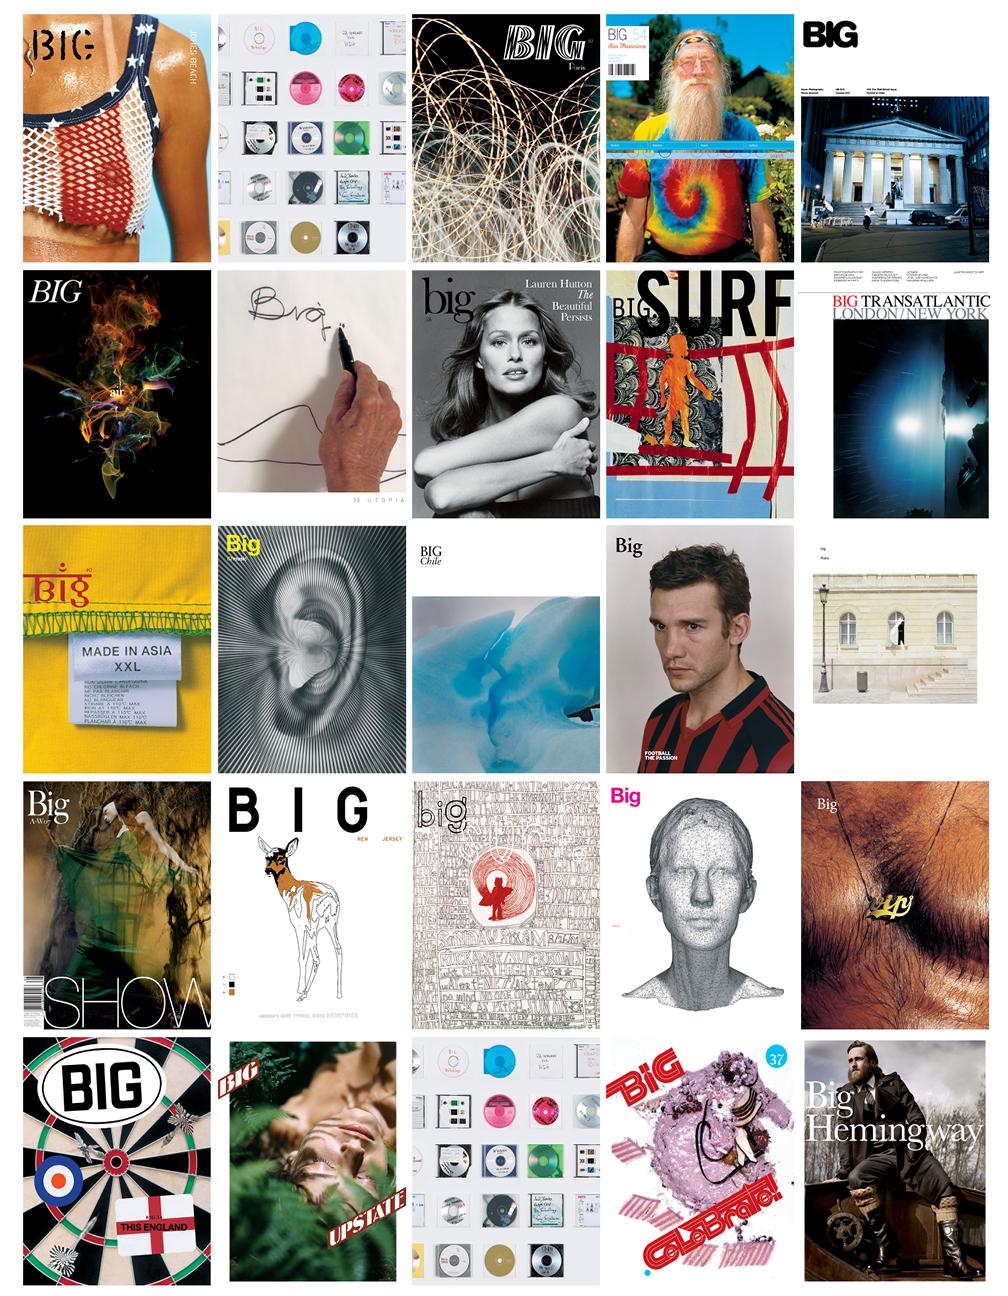 Big_Posters_Posters_sm.jpg